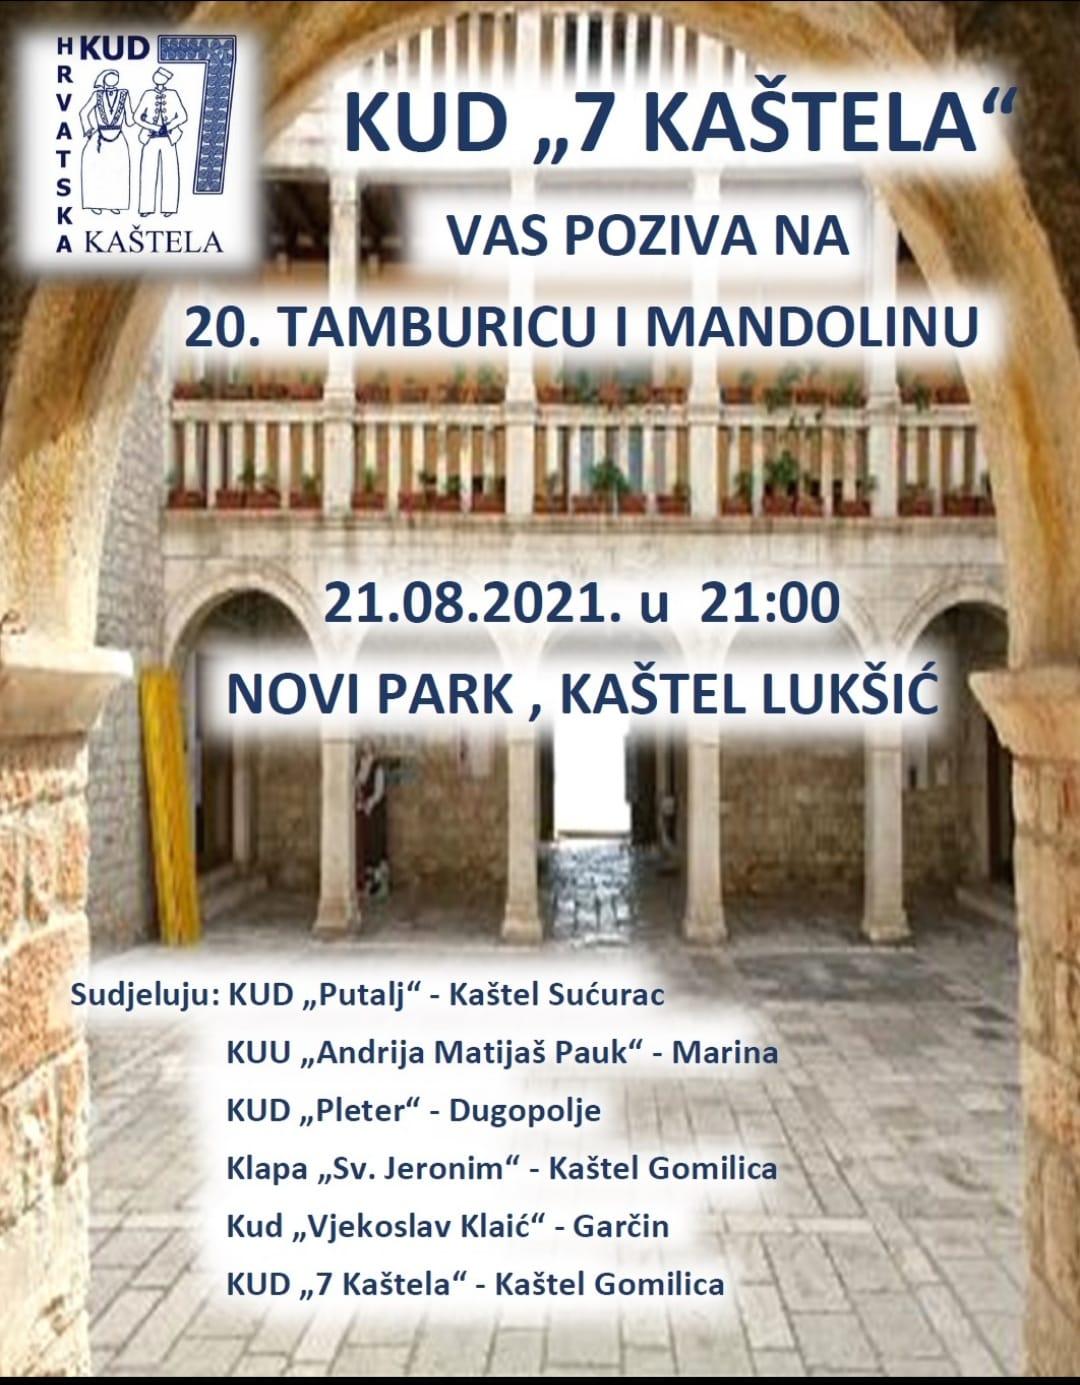 20th traditional 'Tamburica & Mandolin' to be held in Kaštel Lukšić